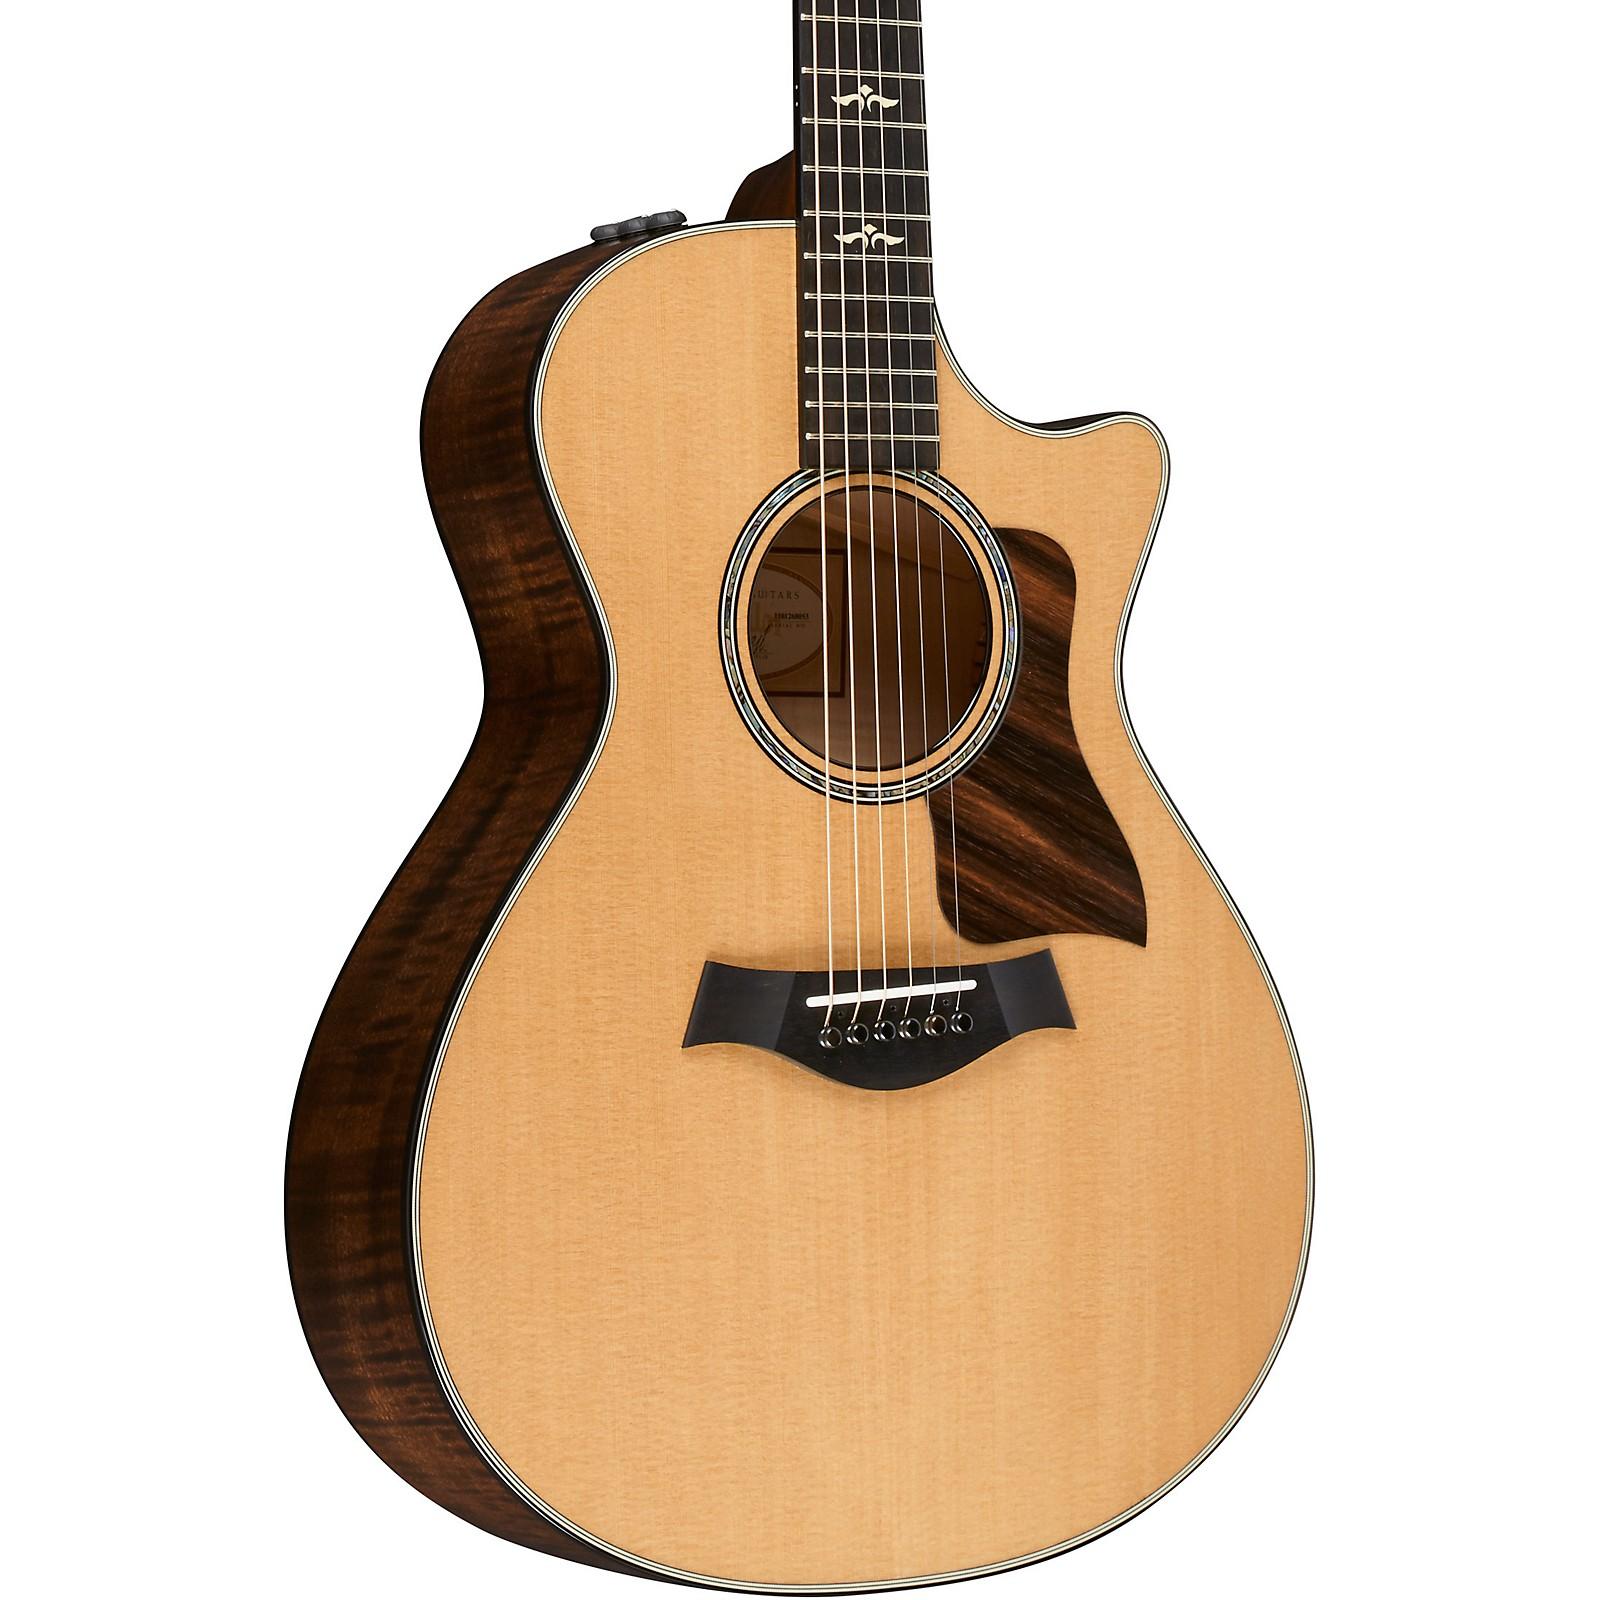 Taylor 612ce Grand Concert Acoustic-Electric Guitar